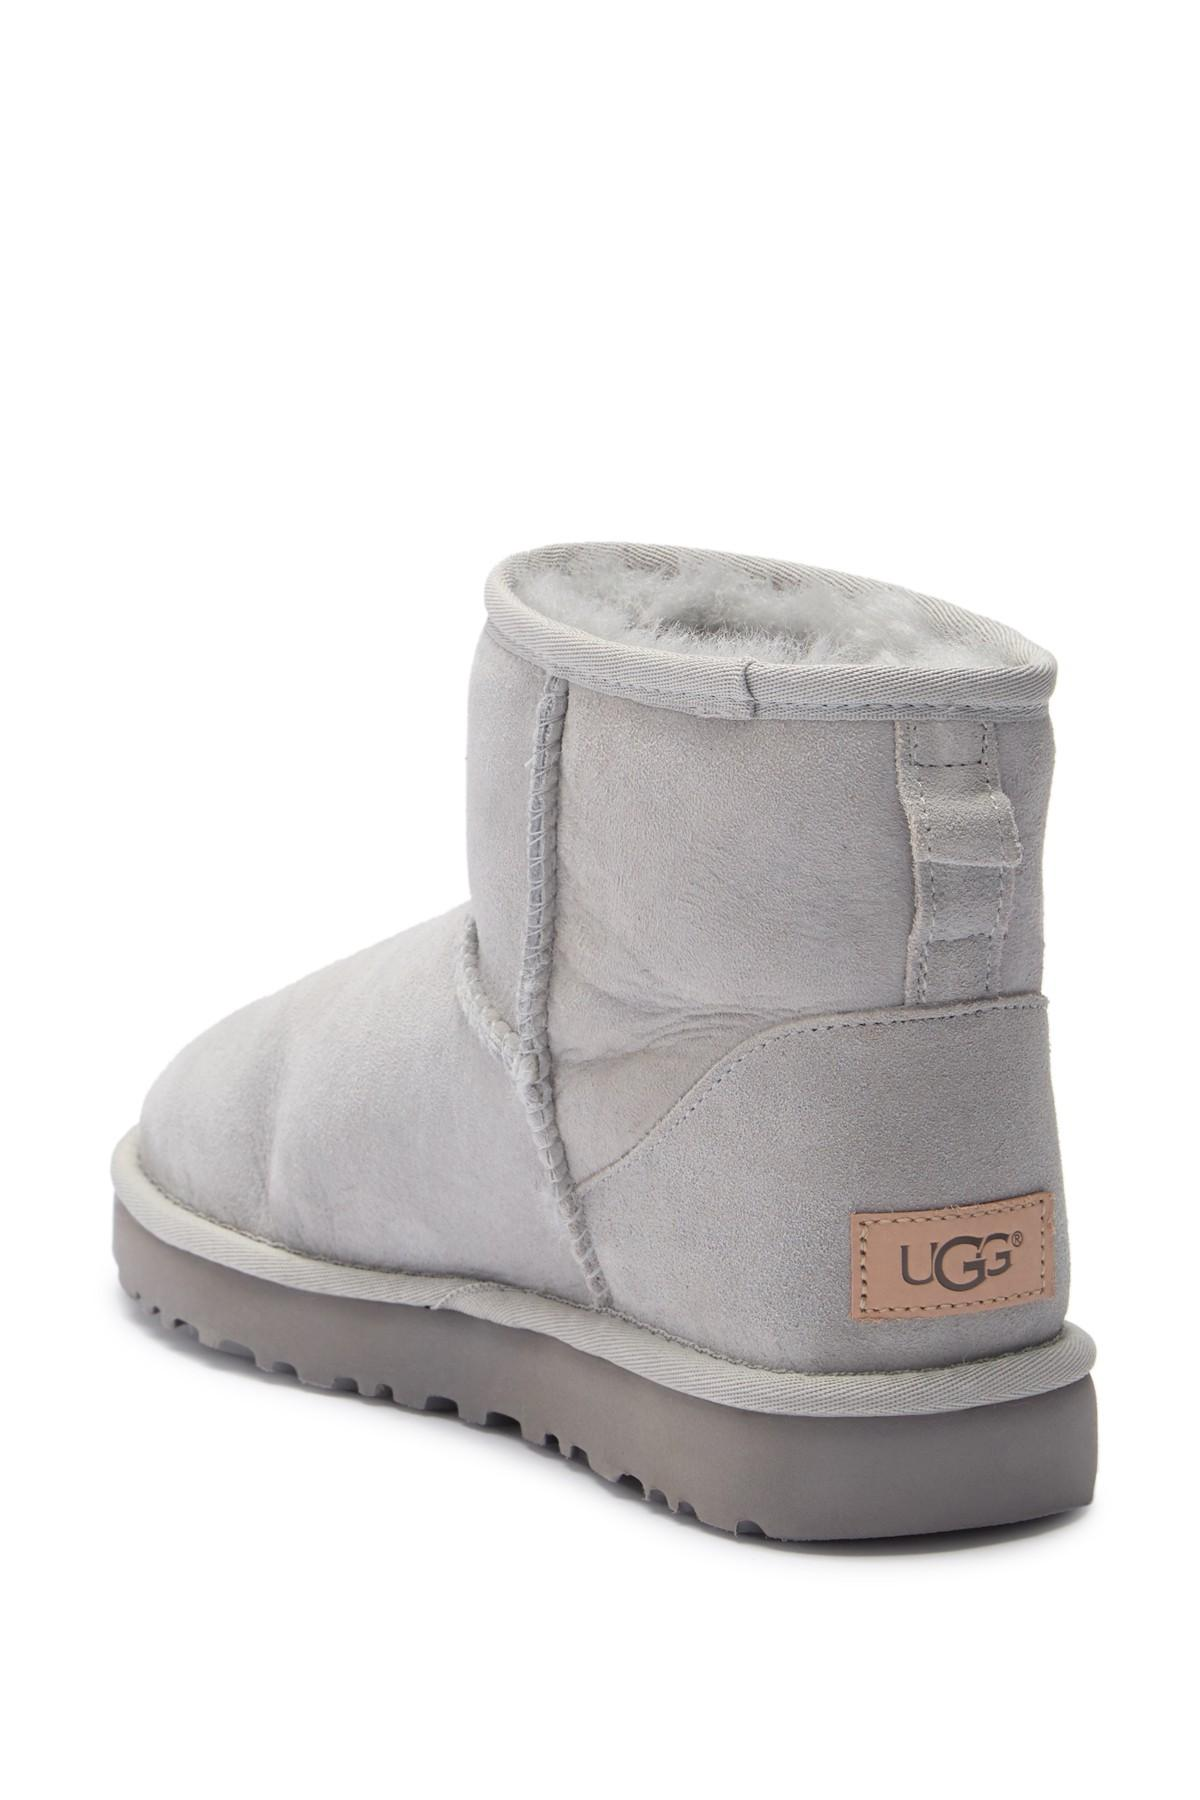 47403be6c49 Ugg Gray (r) Classic Mini Ii Genuine Shearling Lined Boot (women)